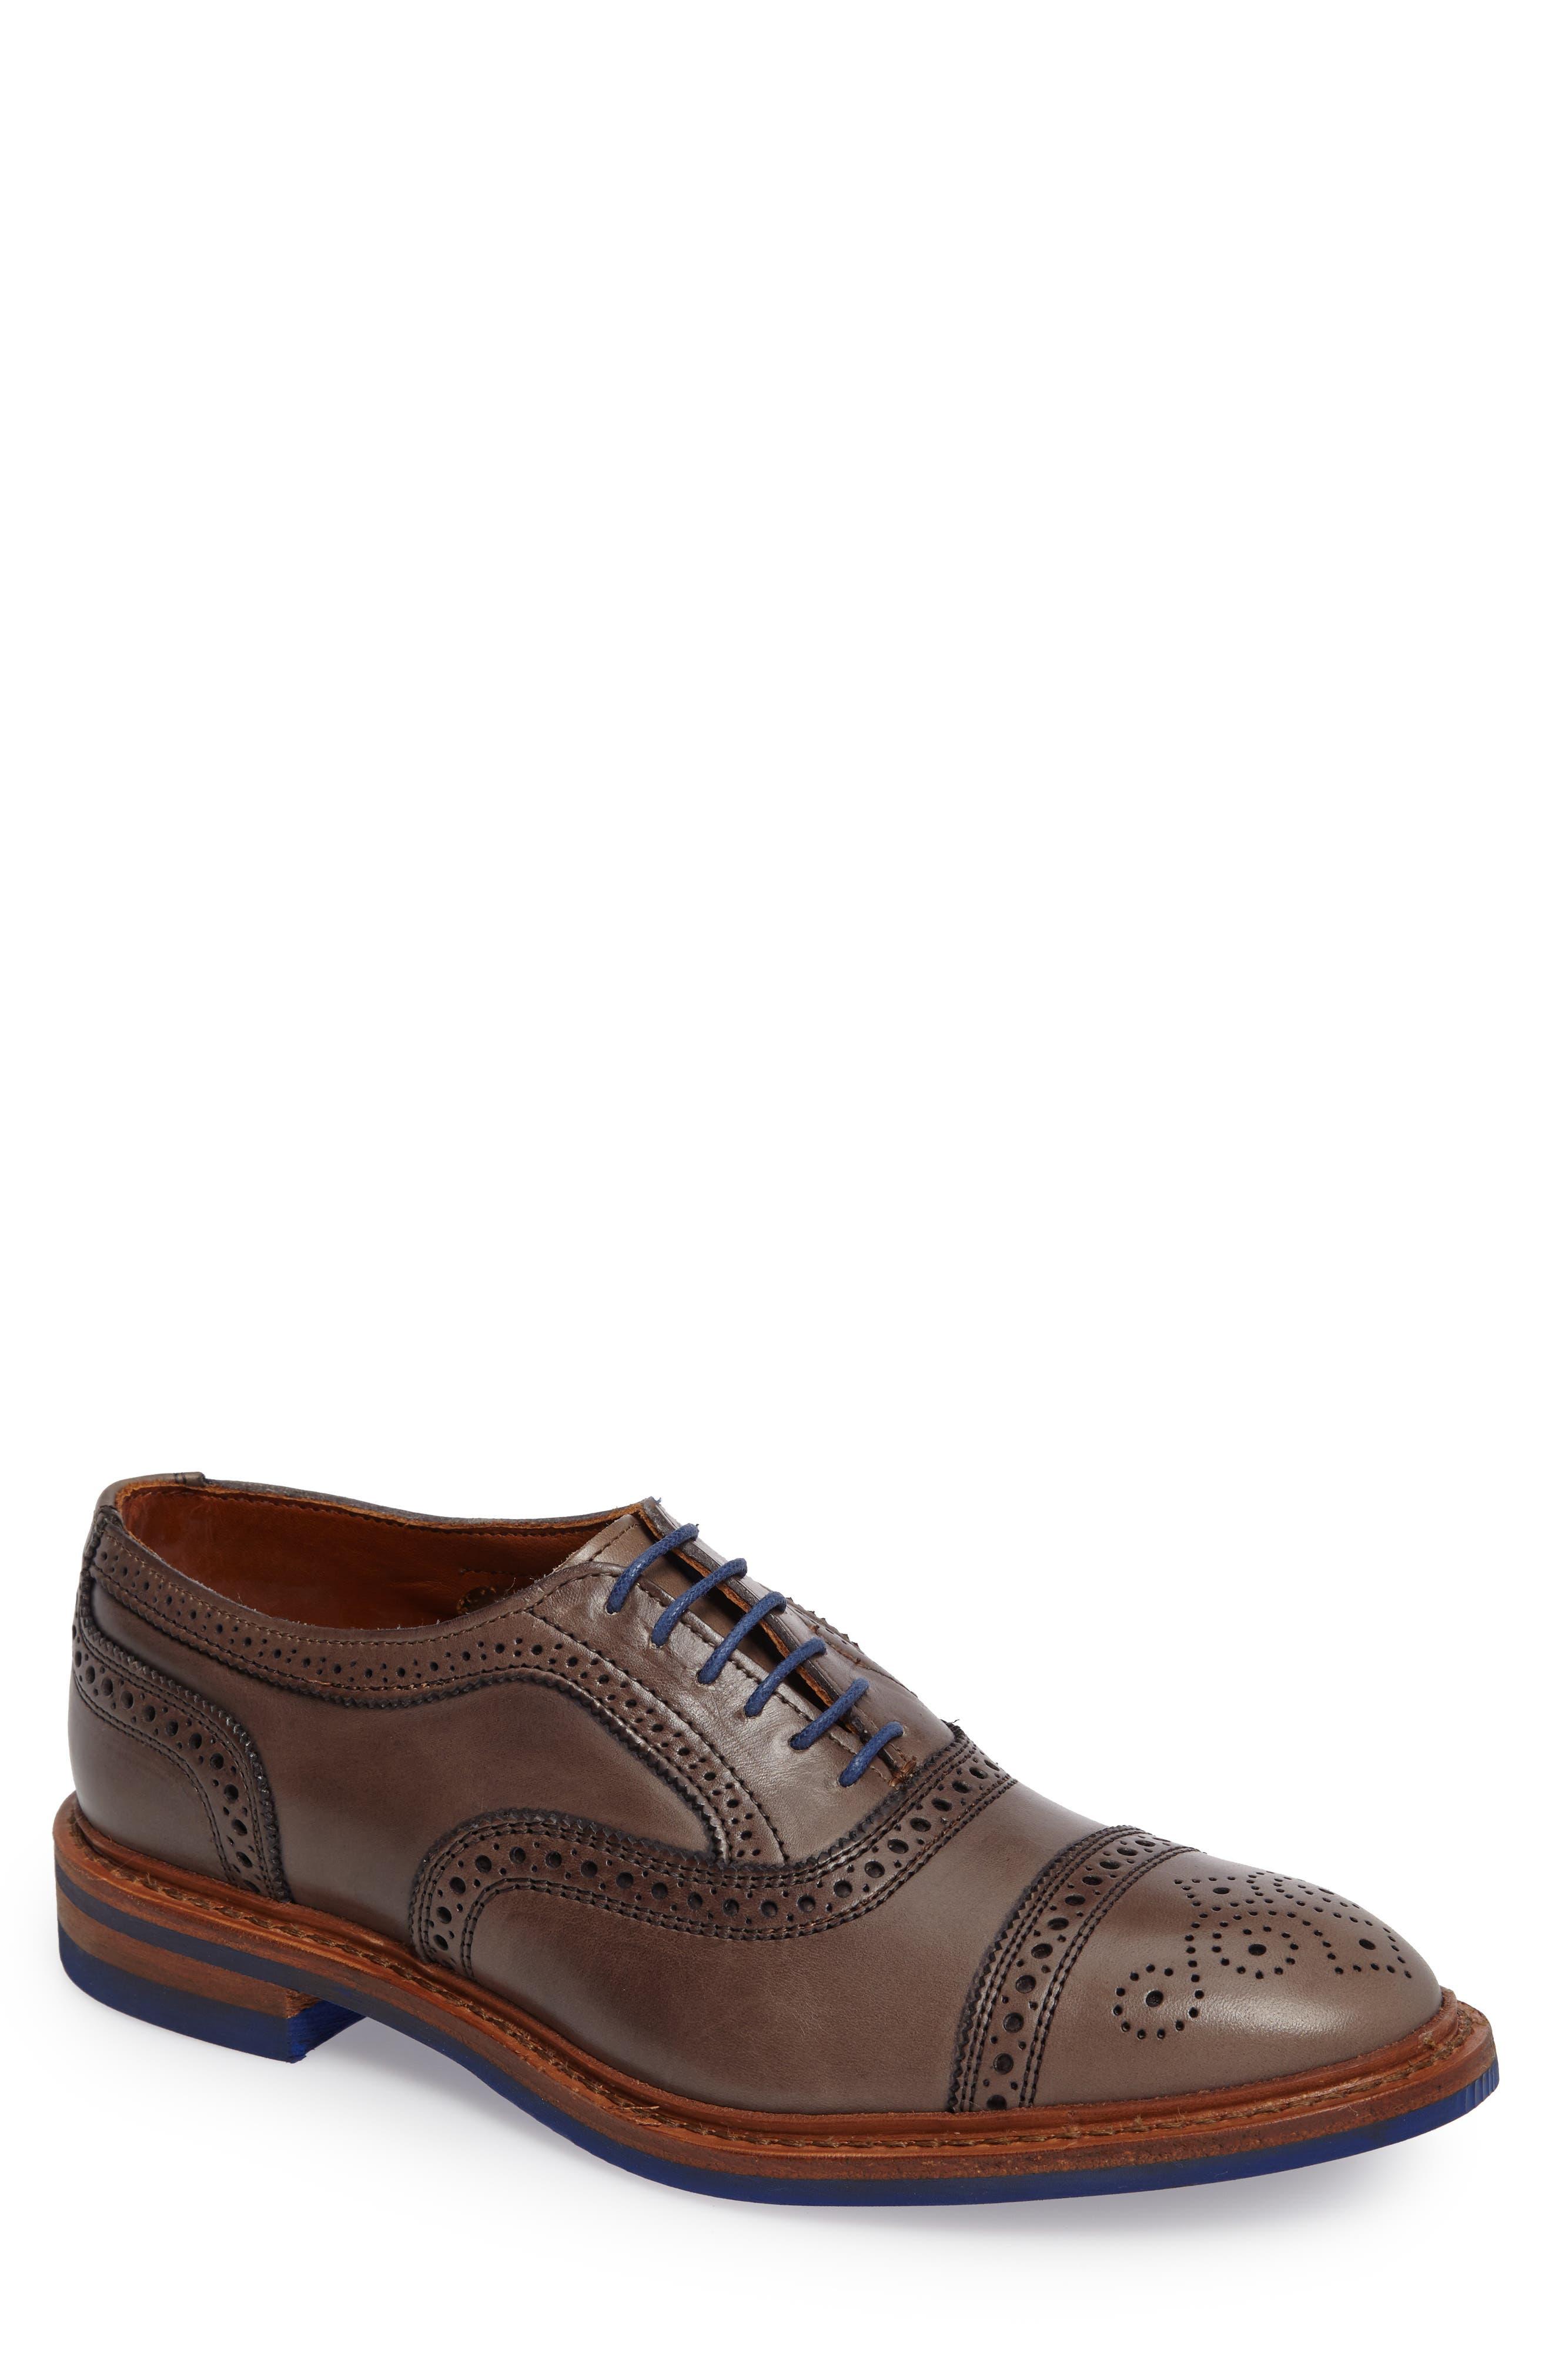 'Strandmok' Cap Toe Oxford,                         Main,                         color, Grey Leather